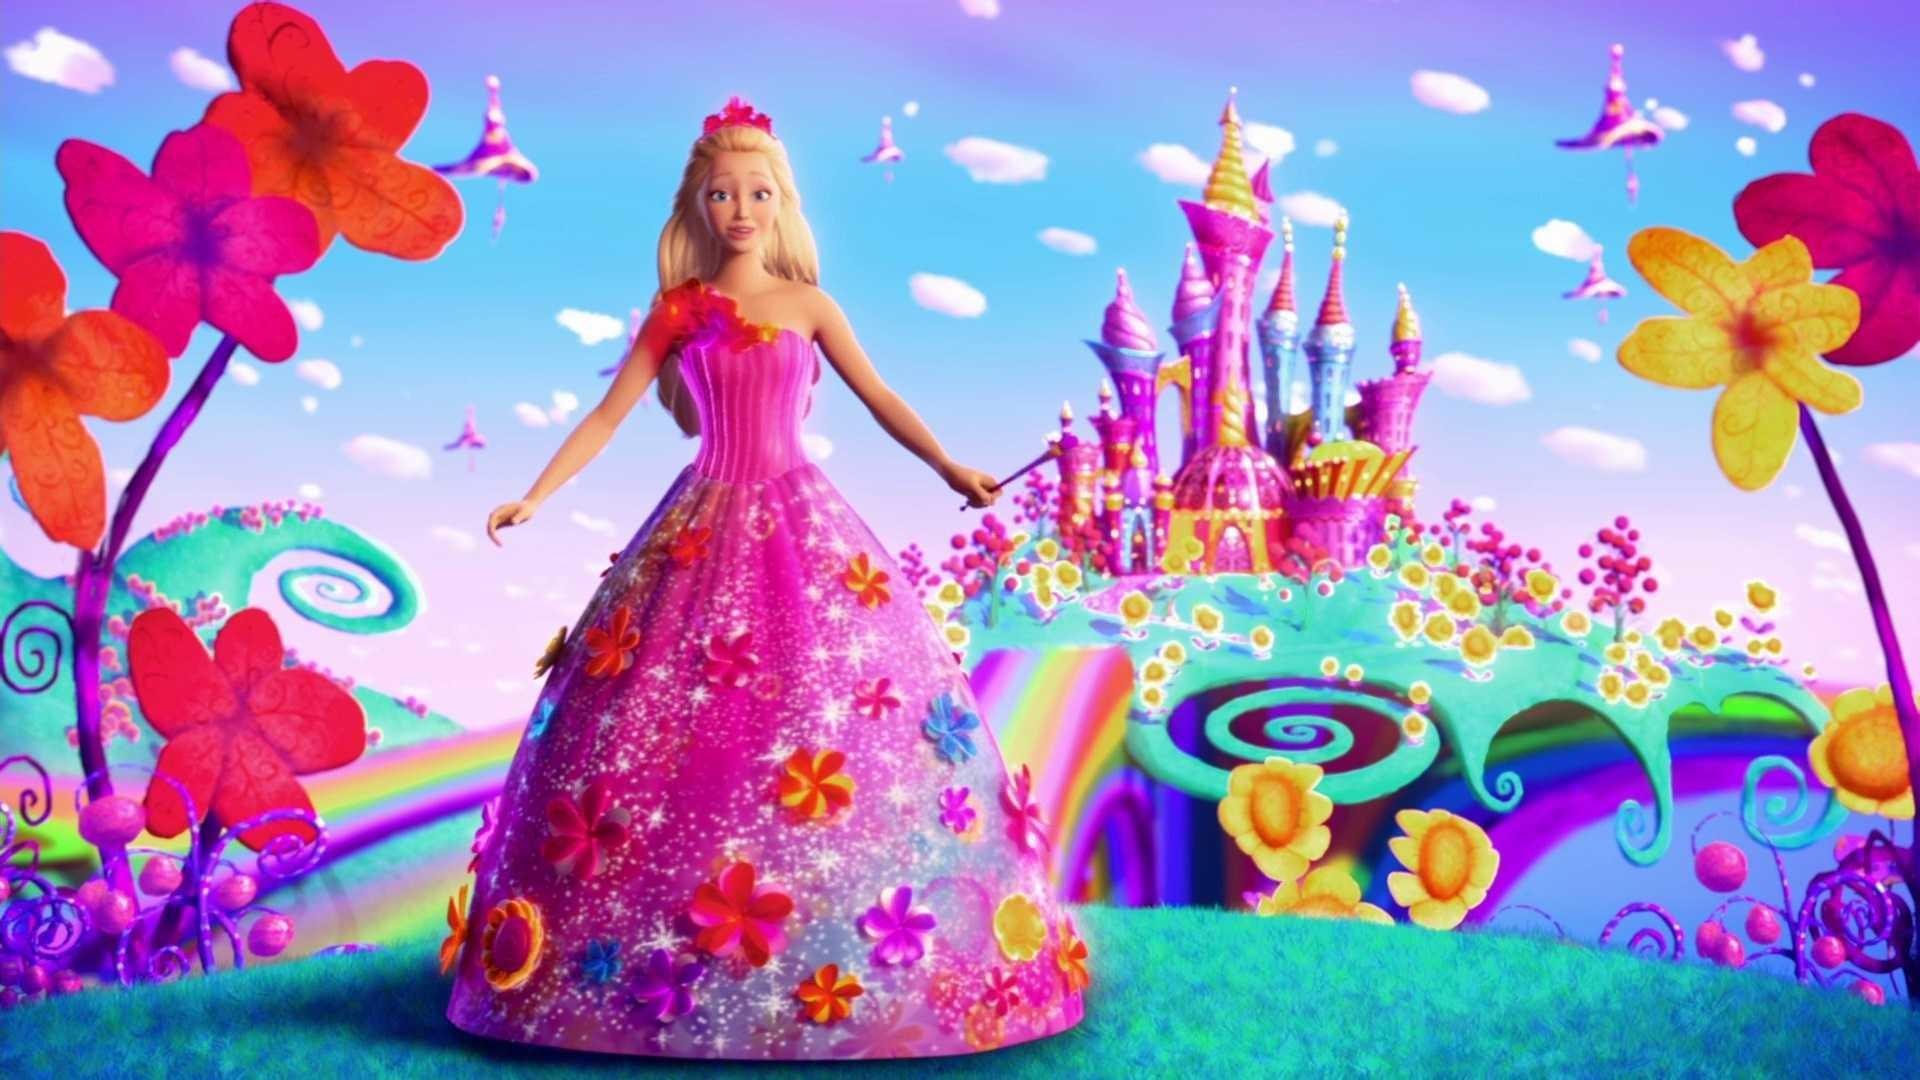 65 wallpaper barbie screensaver hd best wallpaper hd